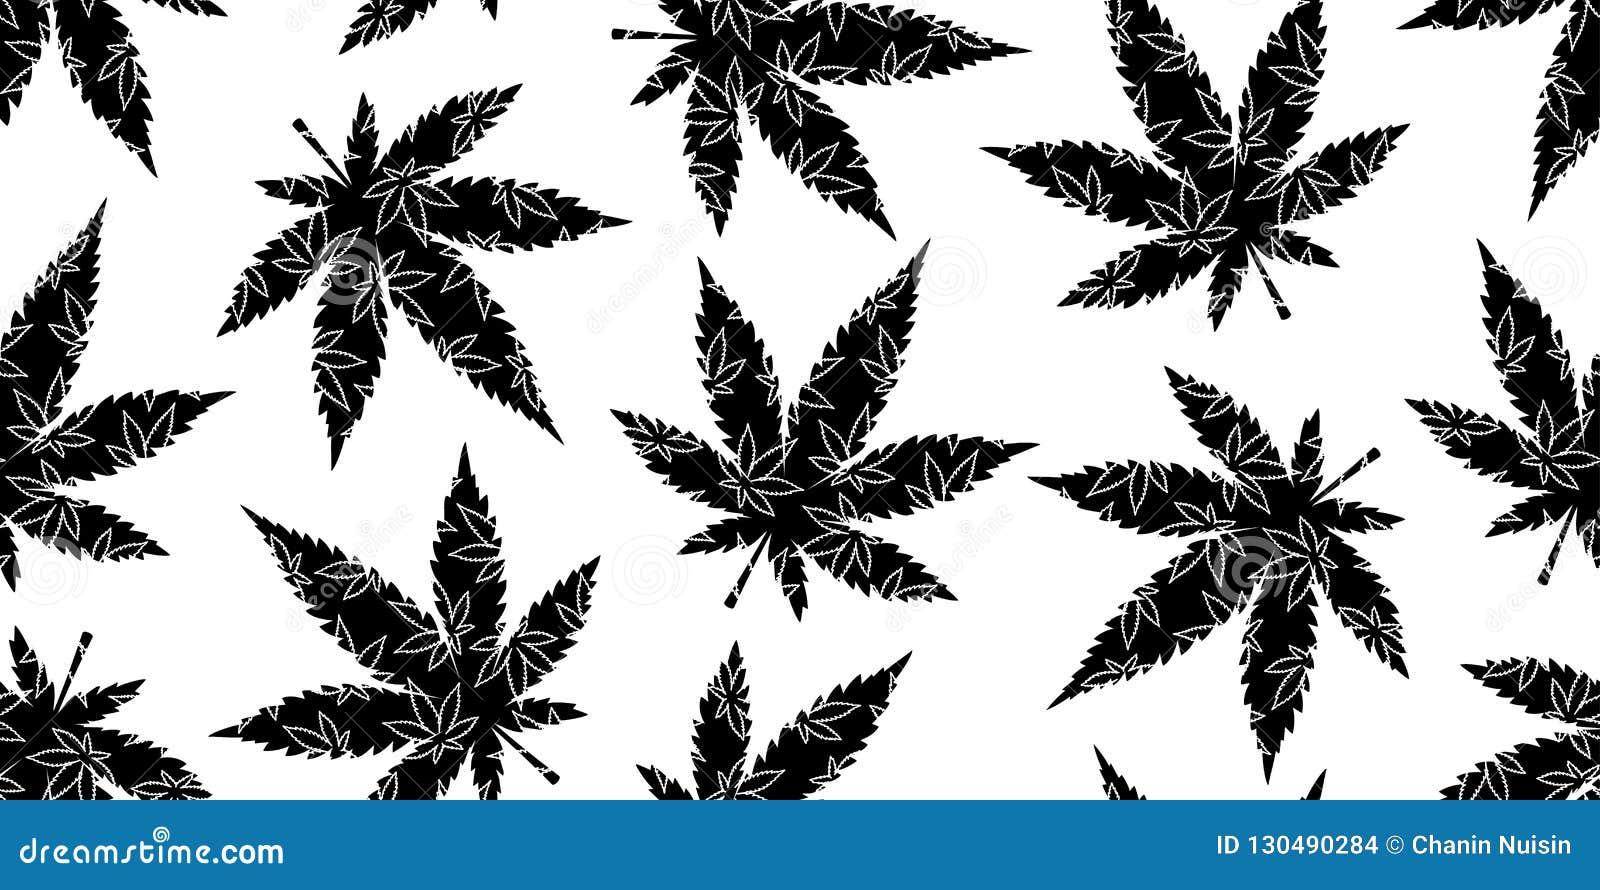 Marijuana Seamless Pattern Weed Cannabis Leaf Camouflage